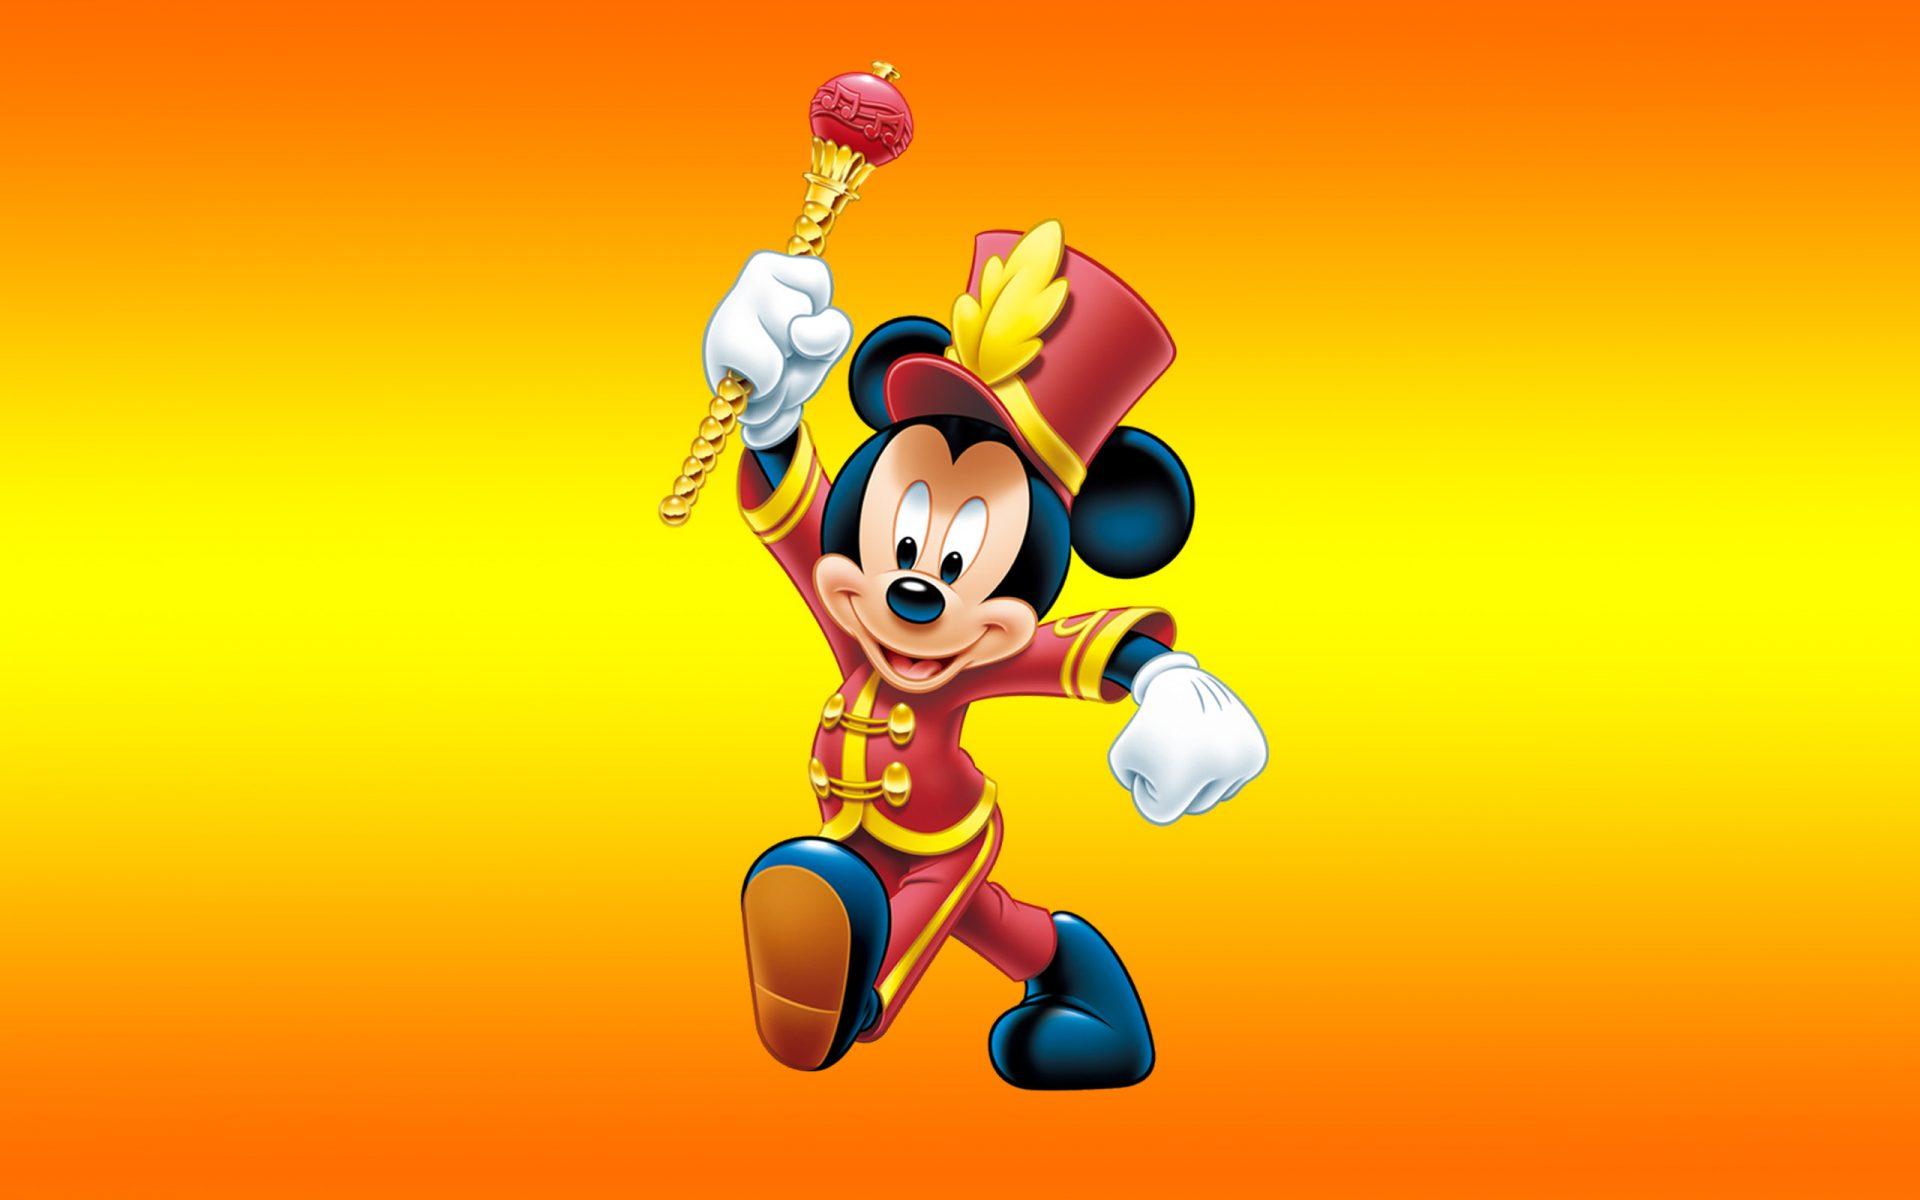 Бесплатные пазлы онлайн для детей флеш игры пазлы маджонг